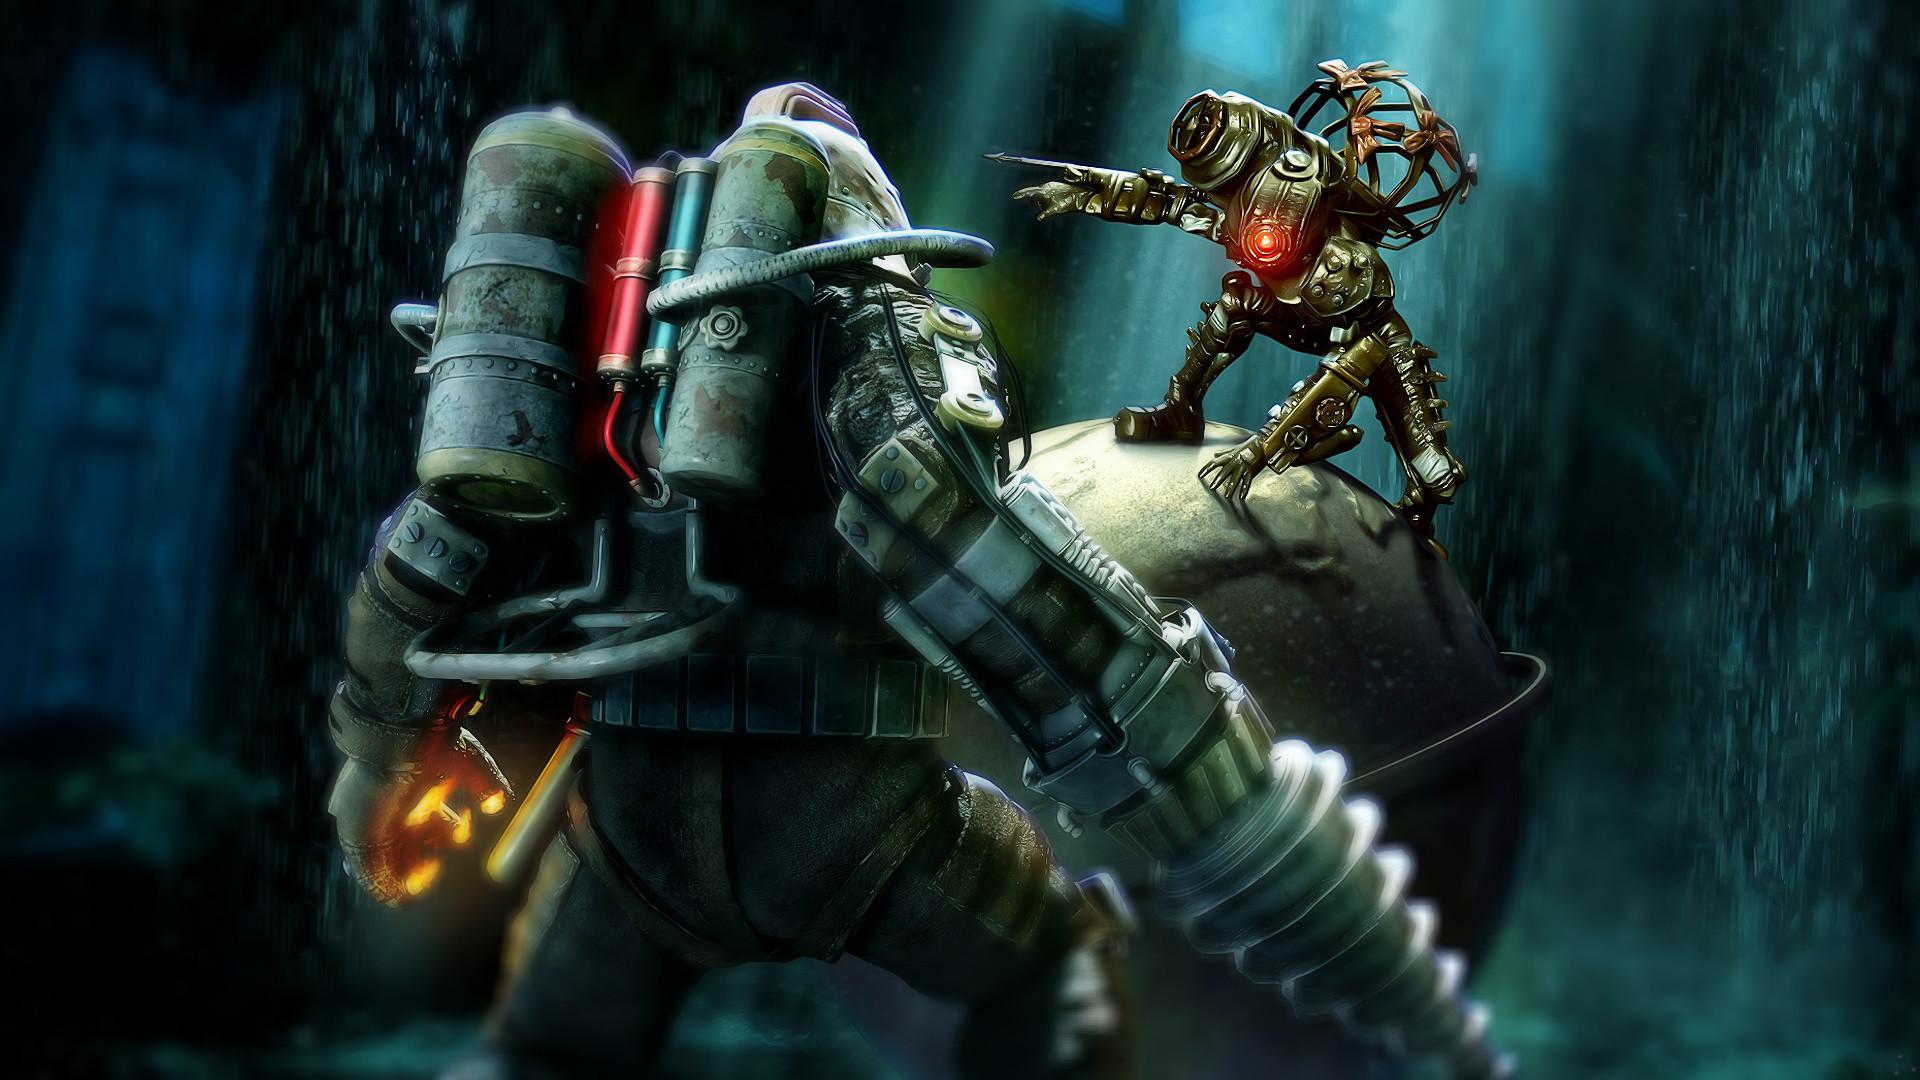 Bioshock Game Wallpapers   HD Wallpapers